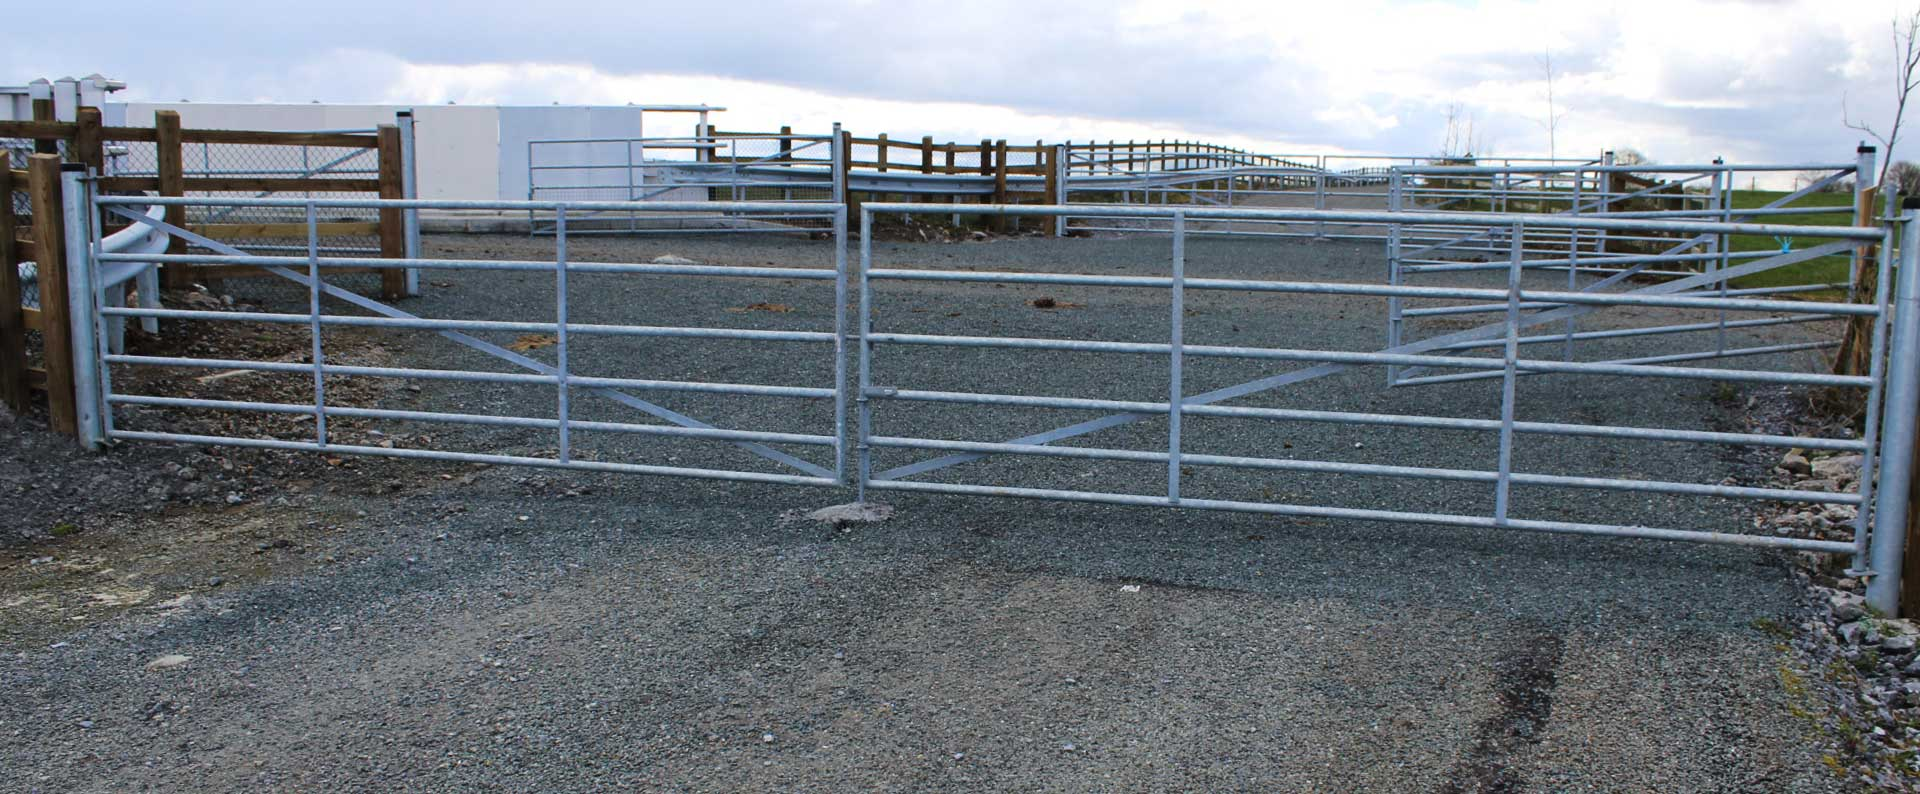 Double Gates Livestock